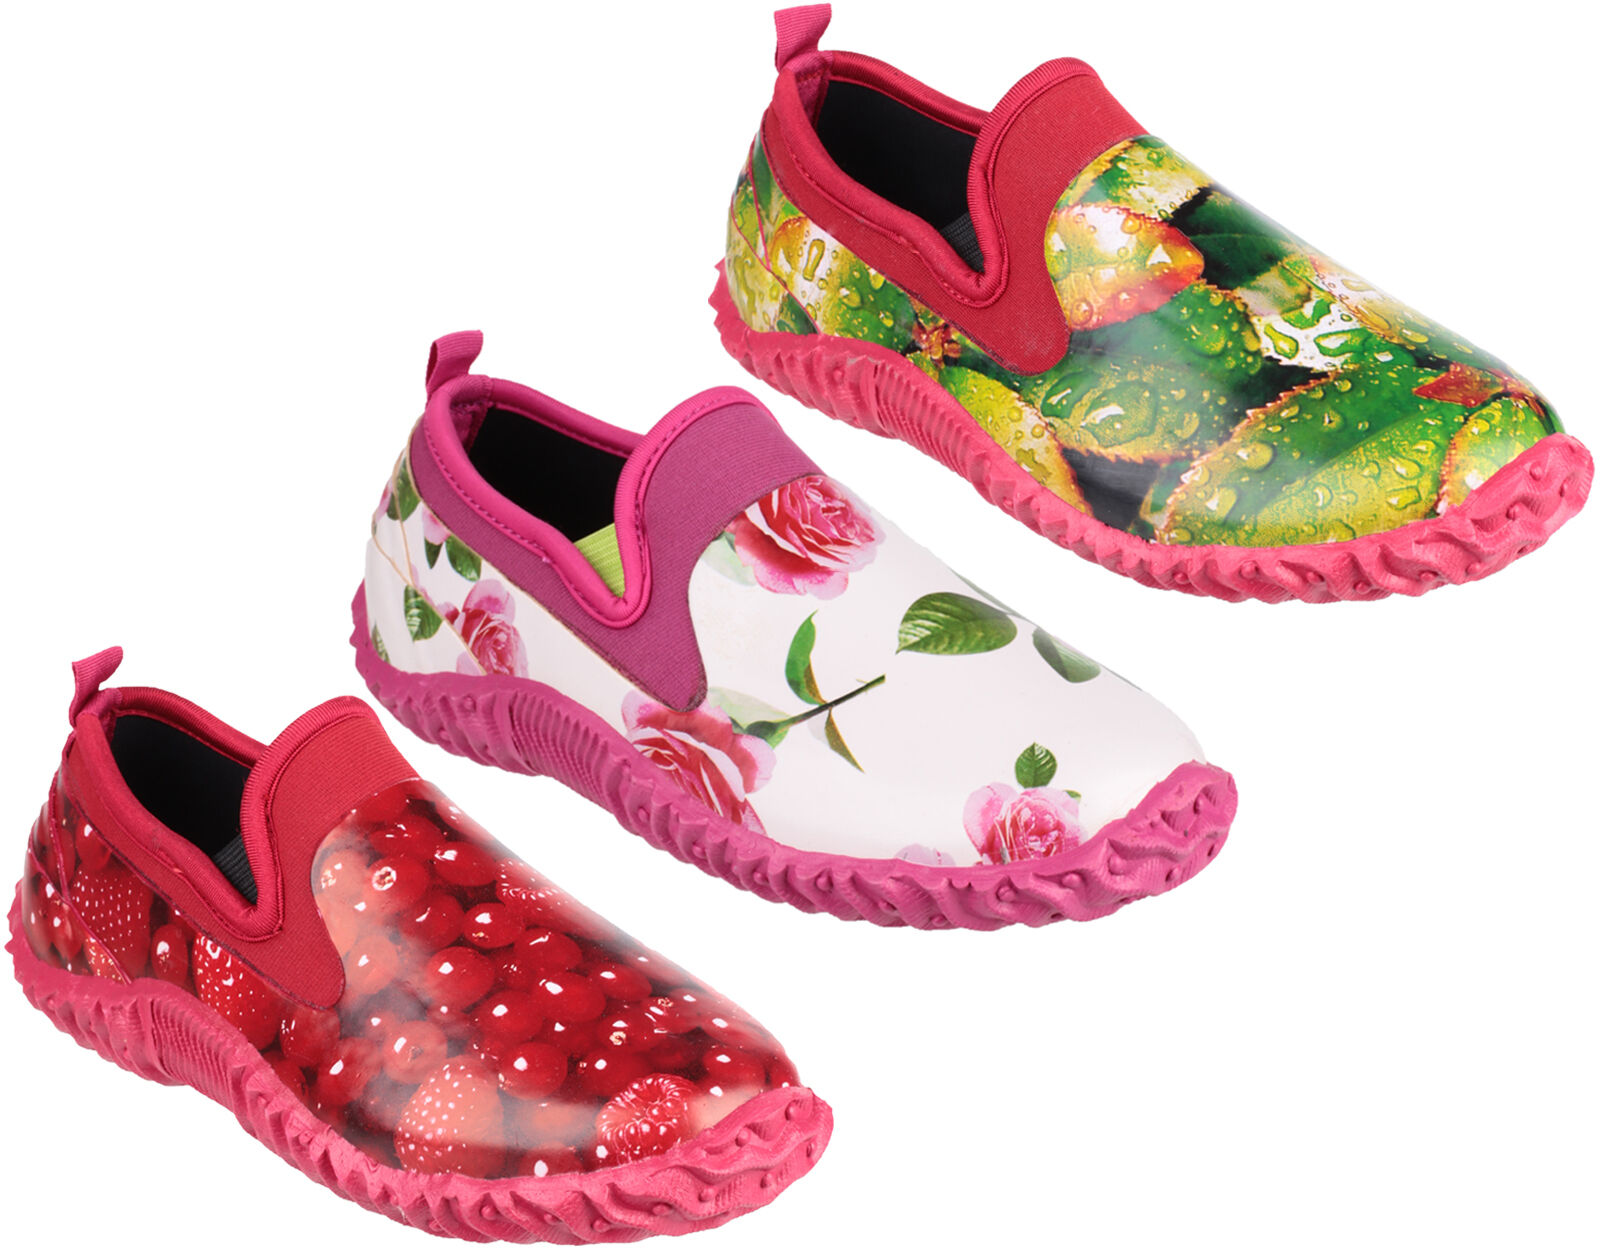 Cotswold Jardinería Tindal Zuecos Jardín Mujer botas Agua Zapatos3-8